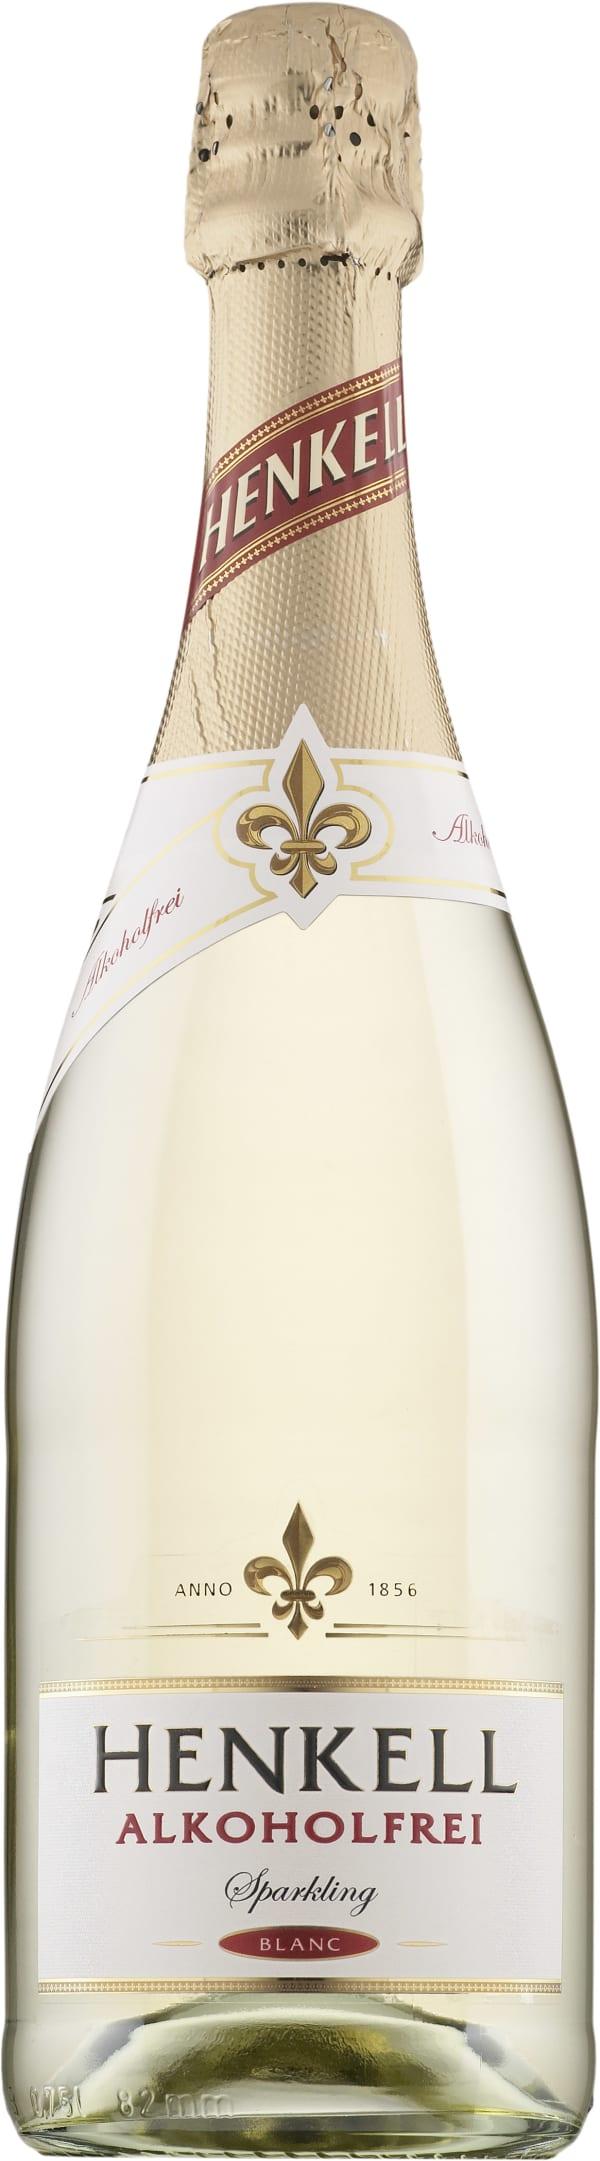 Henkell Alkoholfrei Sparkling Blanc